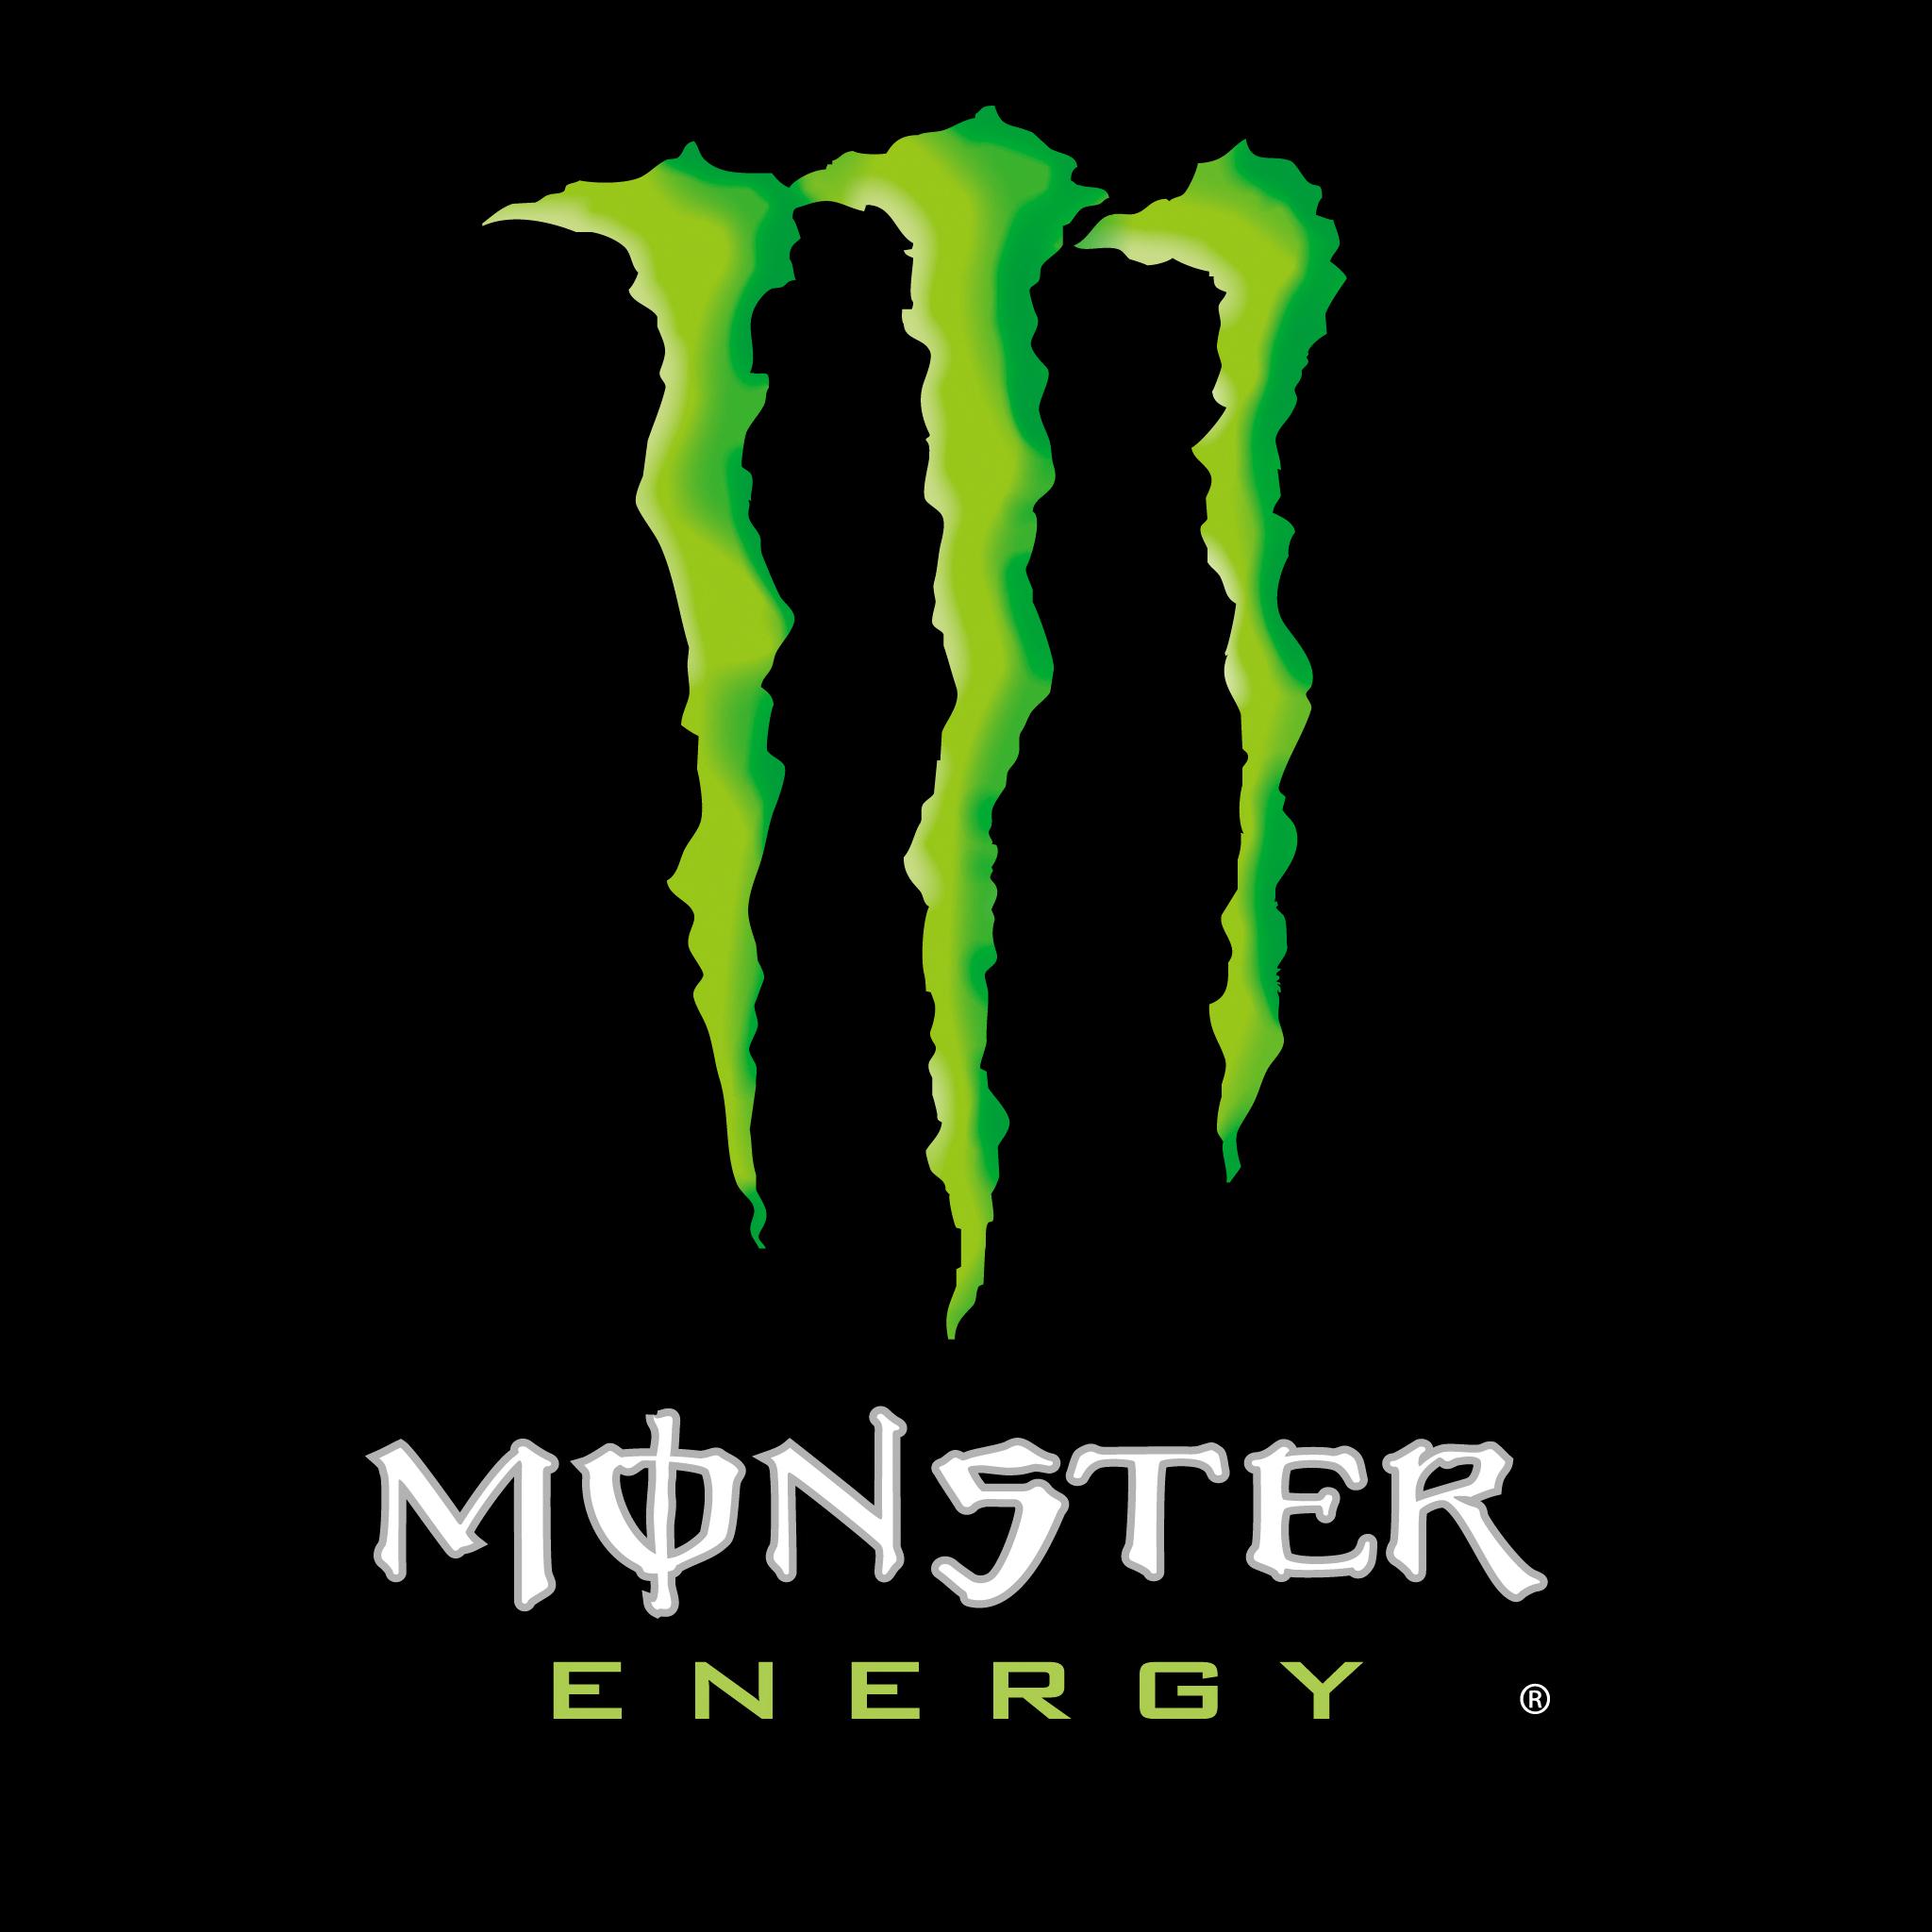 Monster Energy 3Wallpapers iPad Retina Monster Energy   iPad Retina